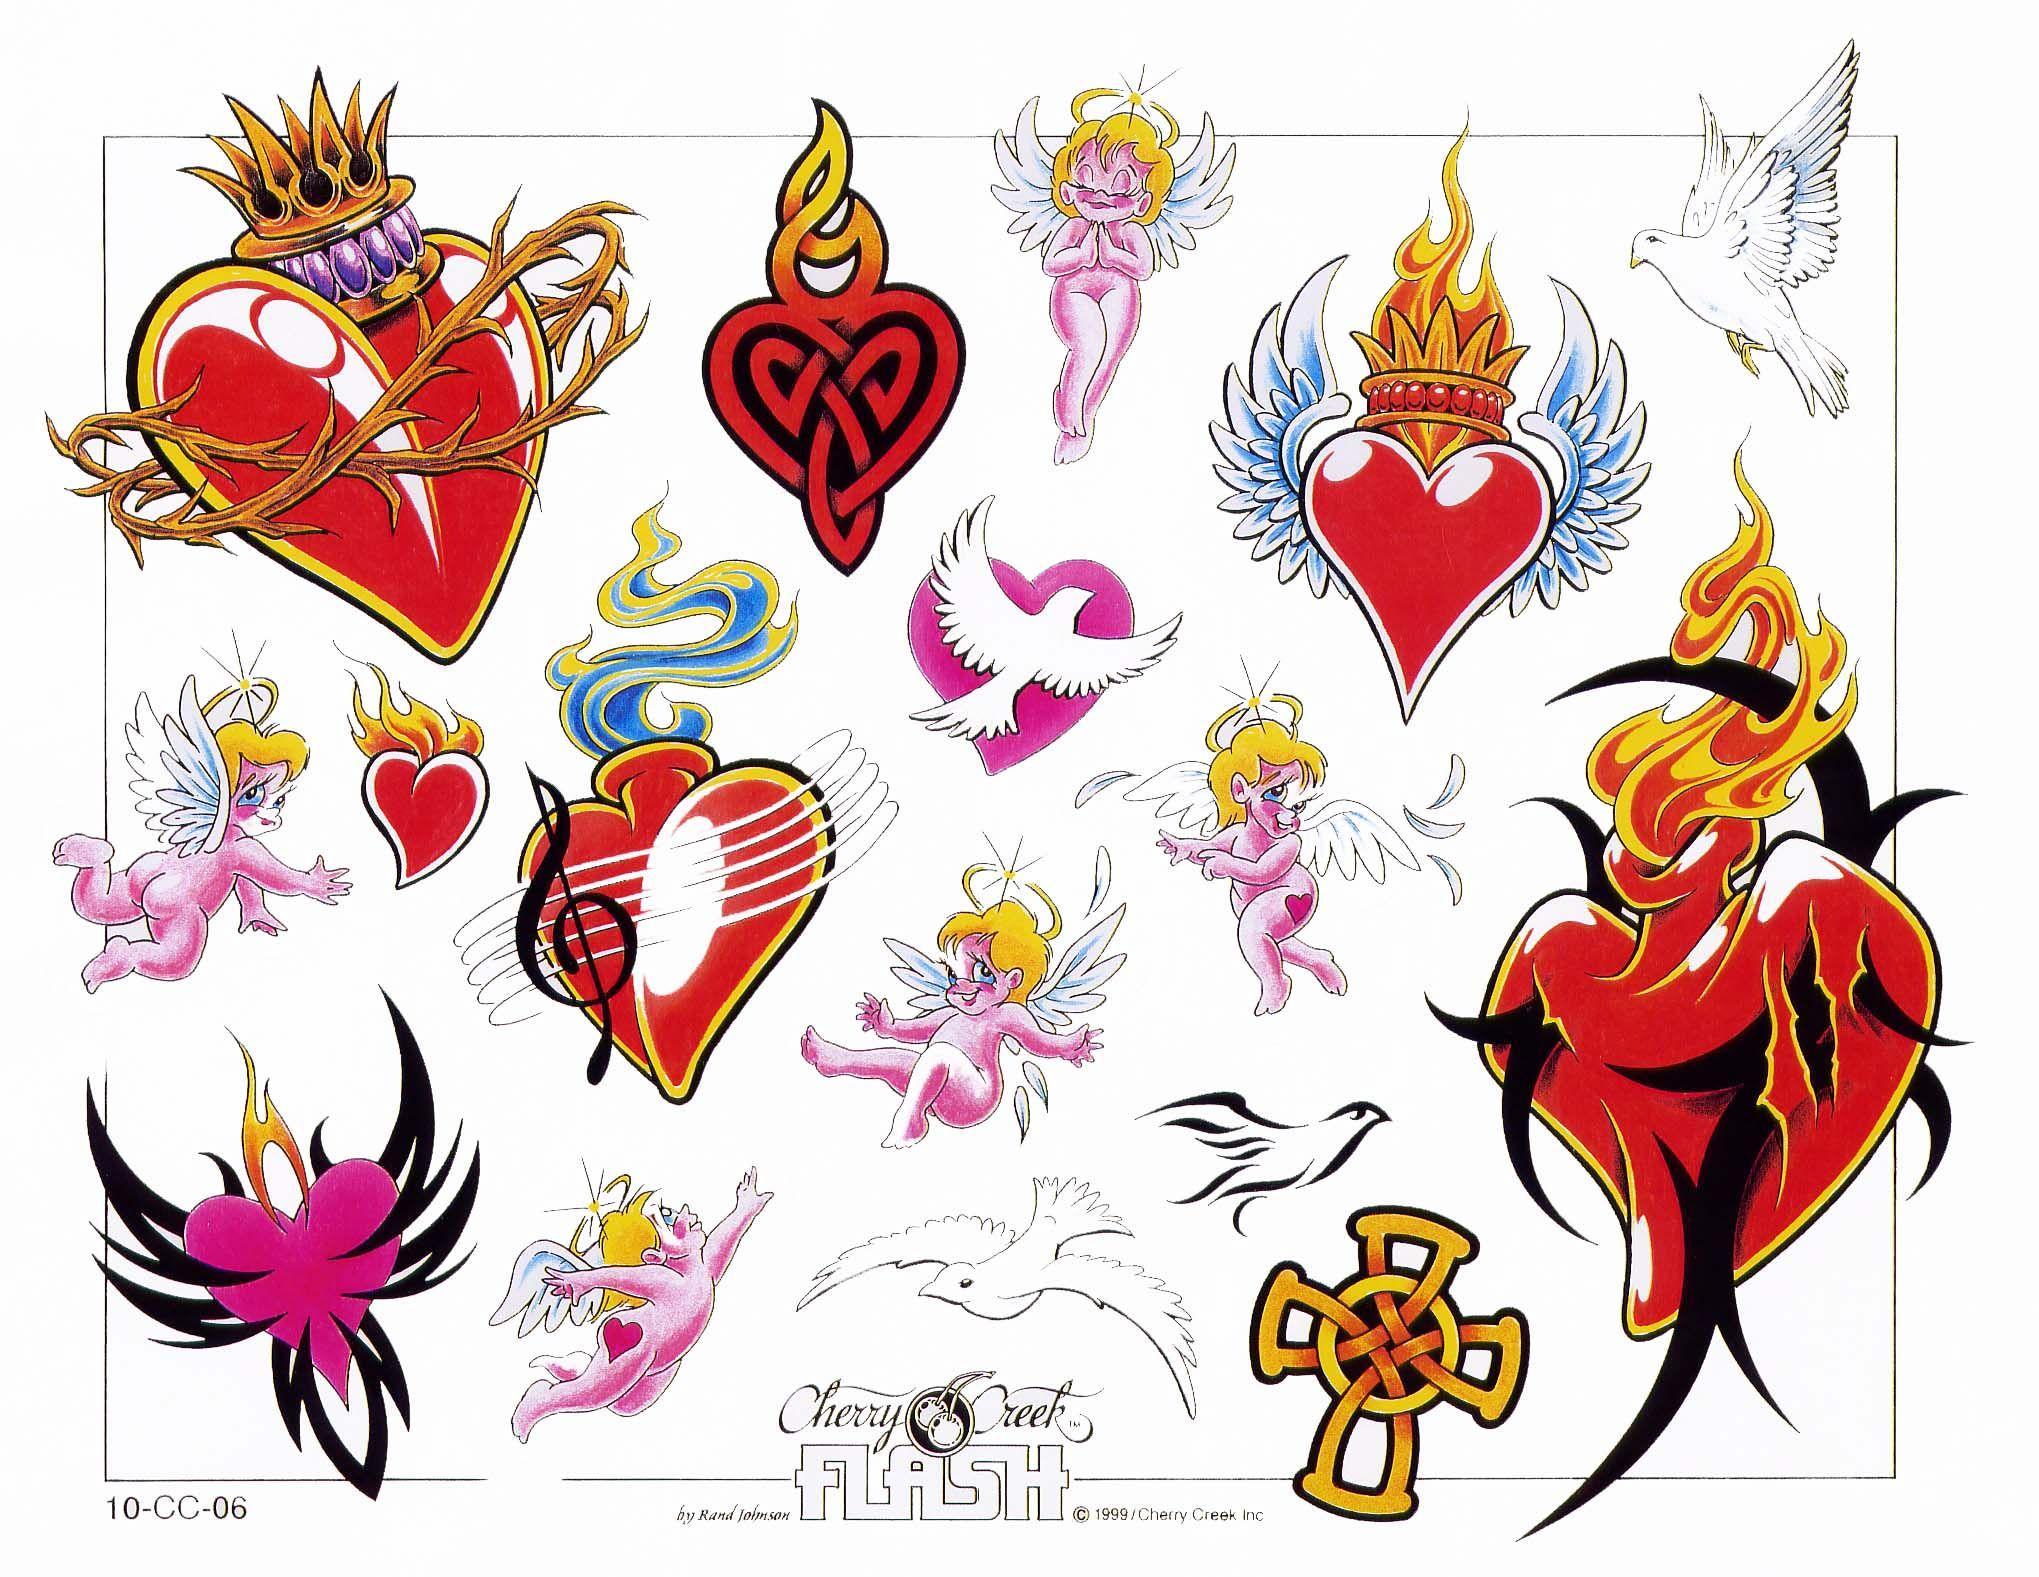 Heart tattoos designs - Tattoo Heart Designs For Women Heart Tattoos1 Types Of Heart Tattoos And Their Significance Donnauwanna Pinterest Tattoo Hearts Tattoo Designs And